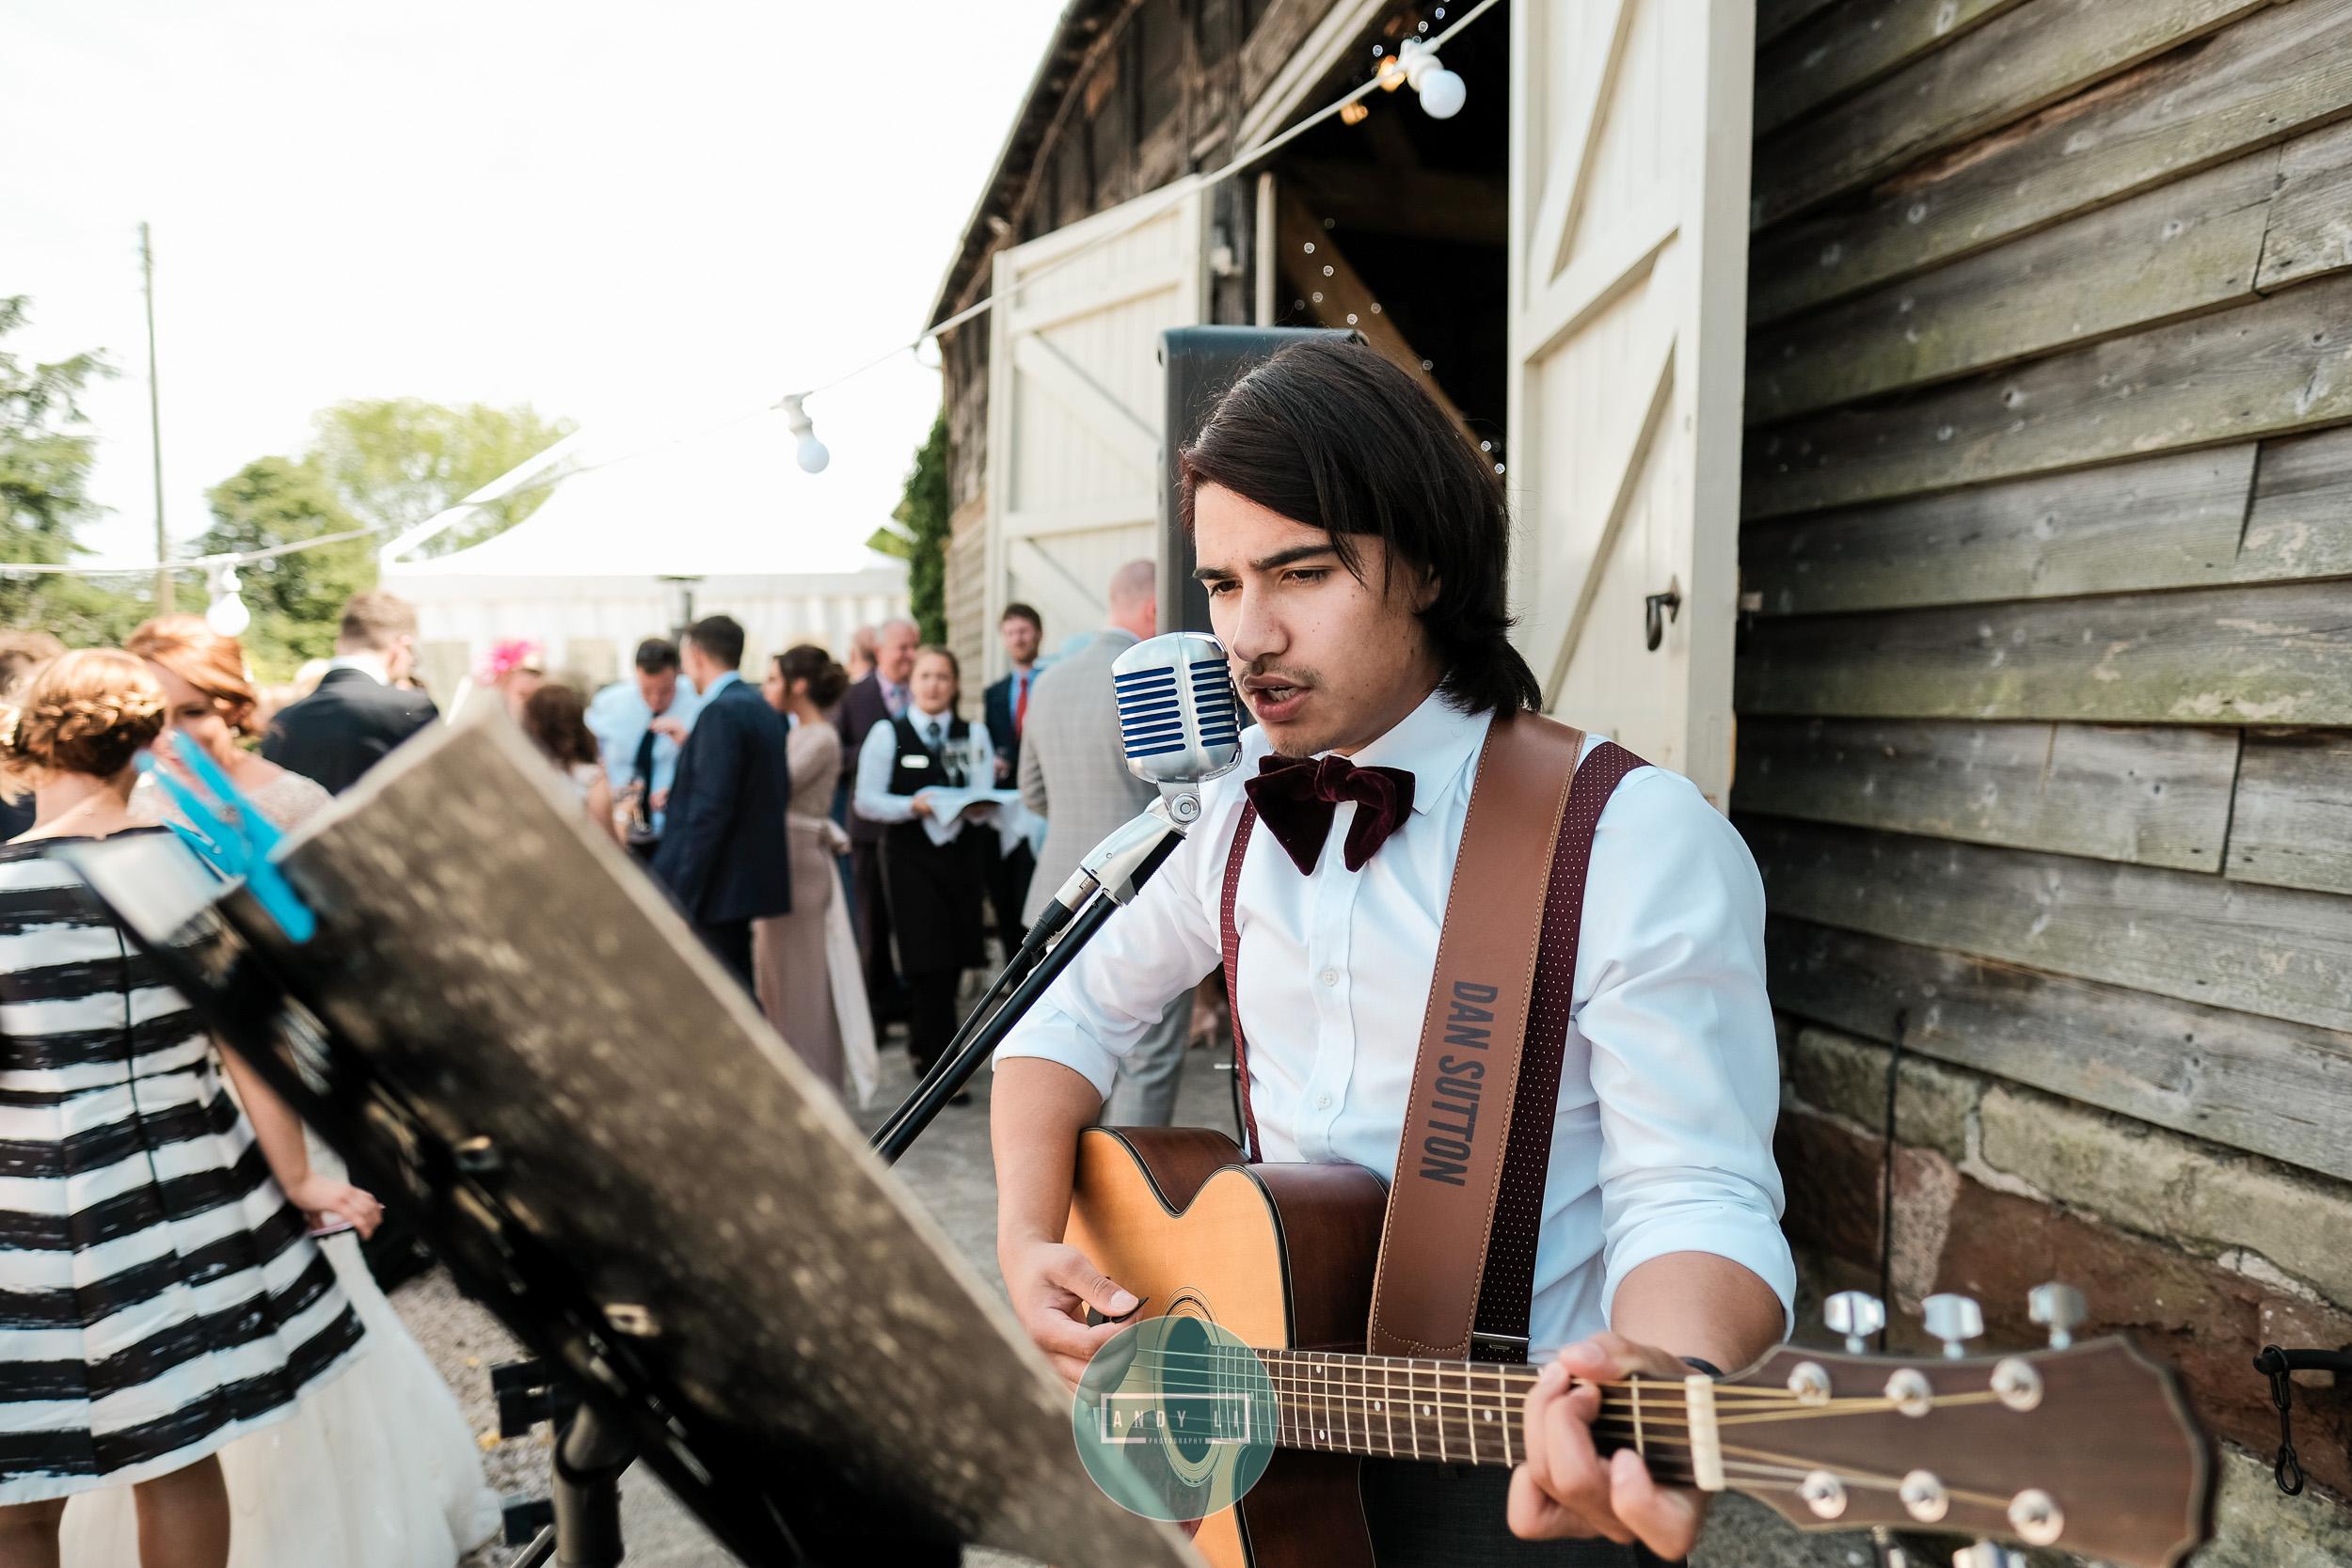 Pimhill Barn Wedding Photographer-072-XPRO6227.jpg